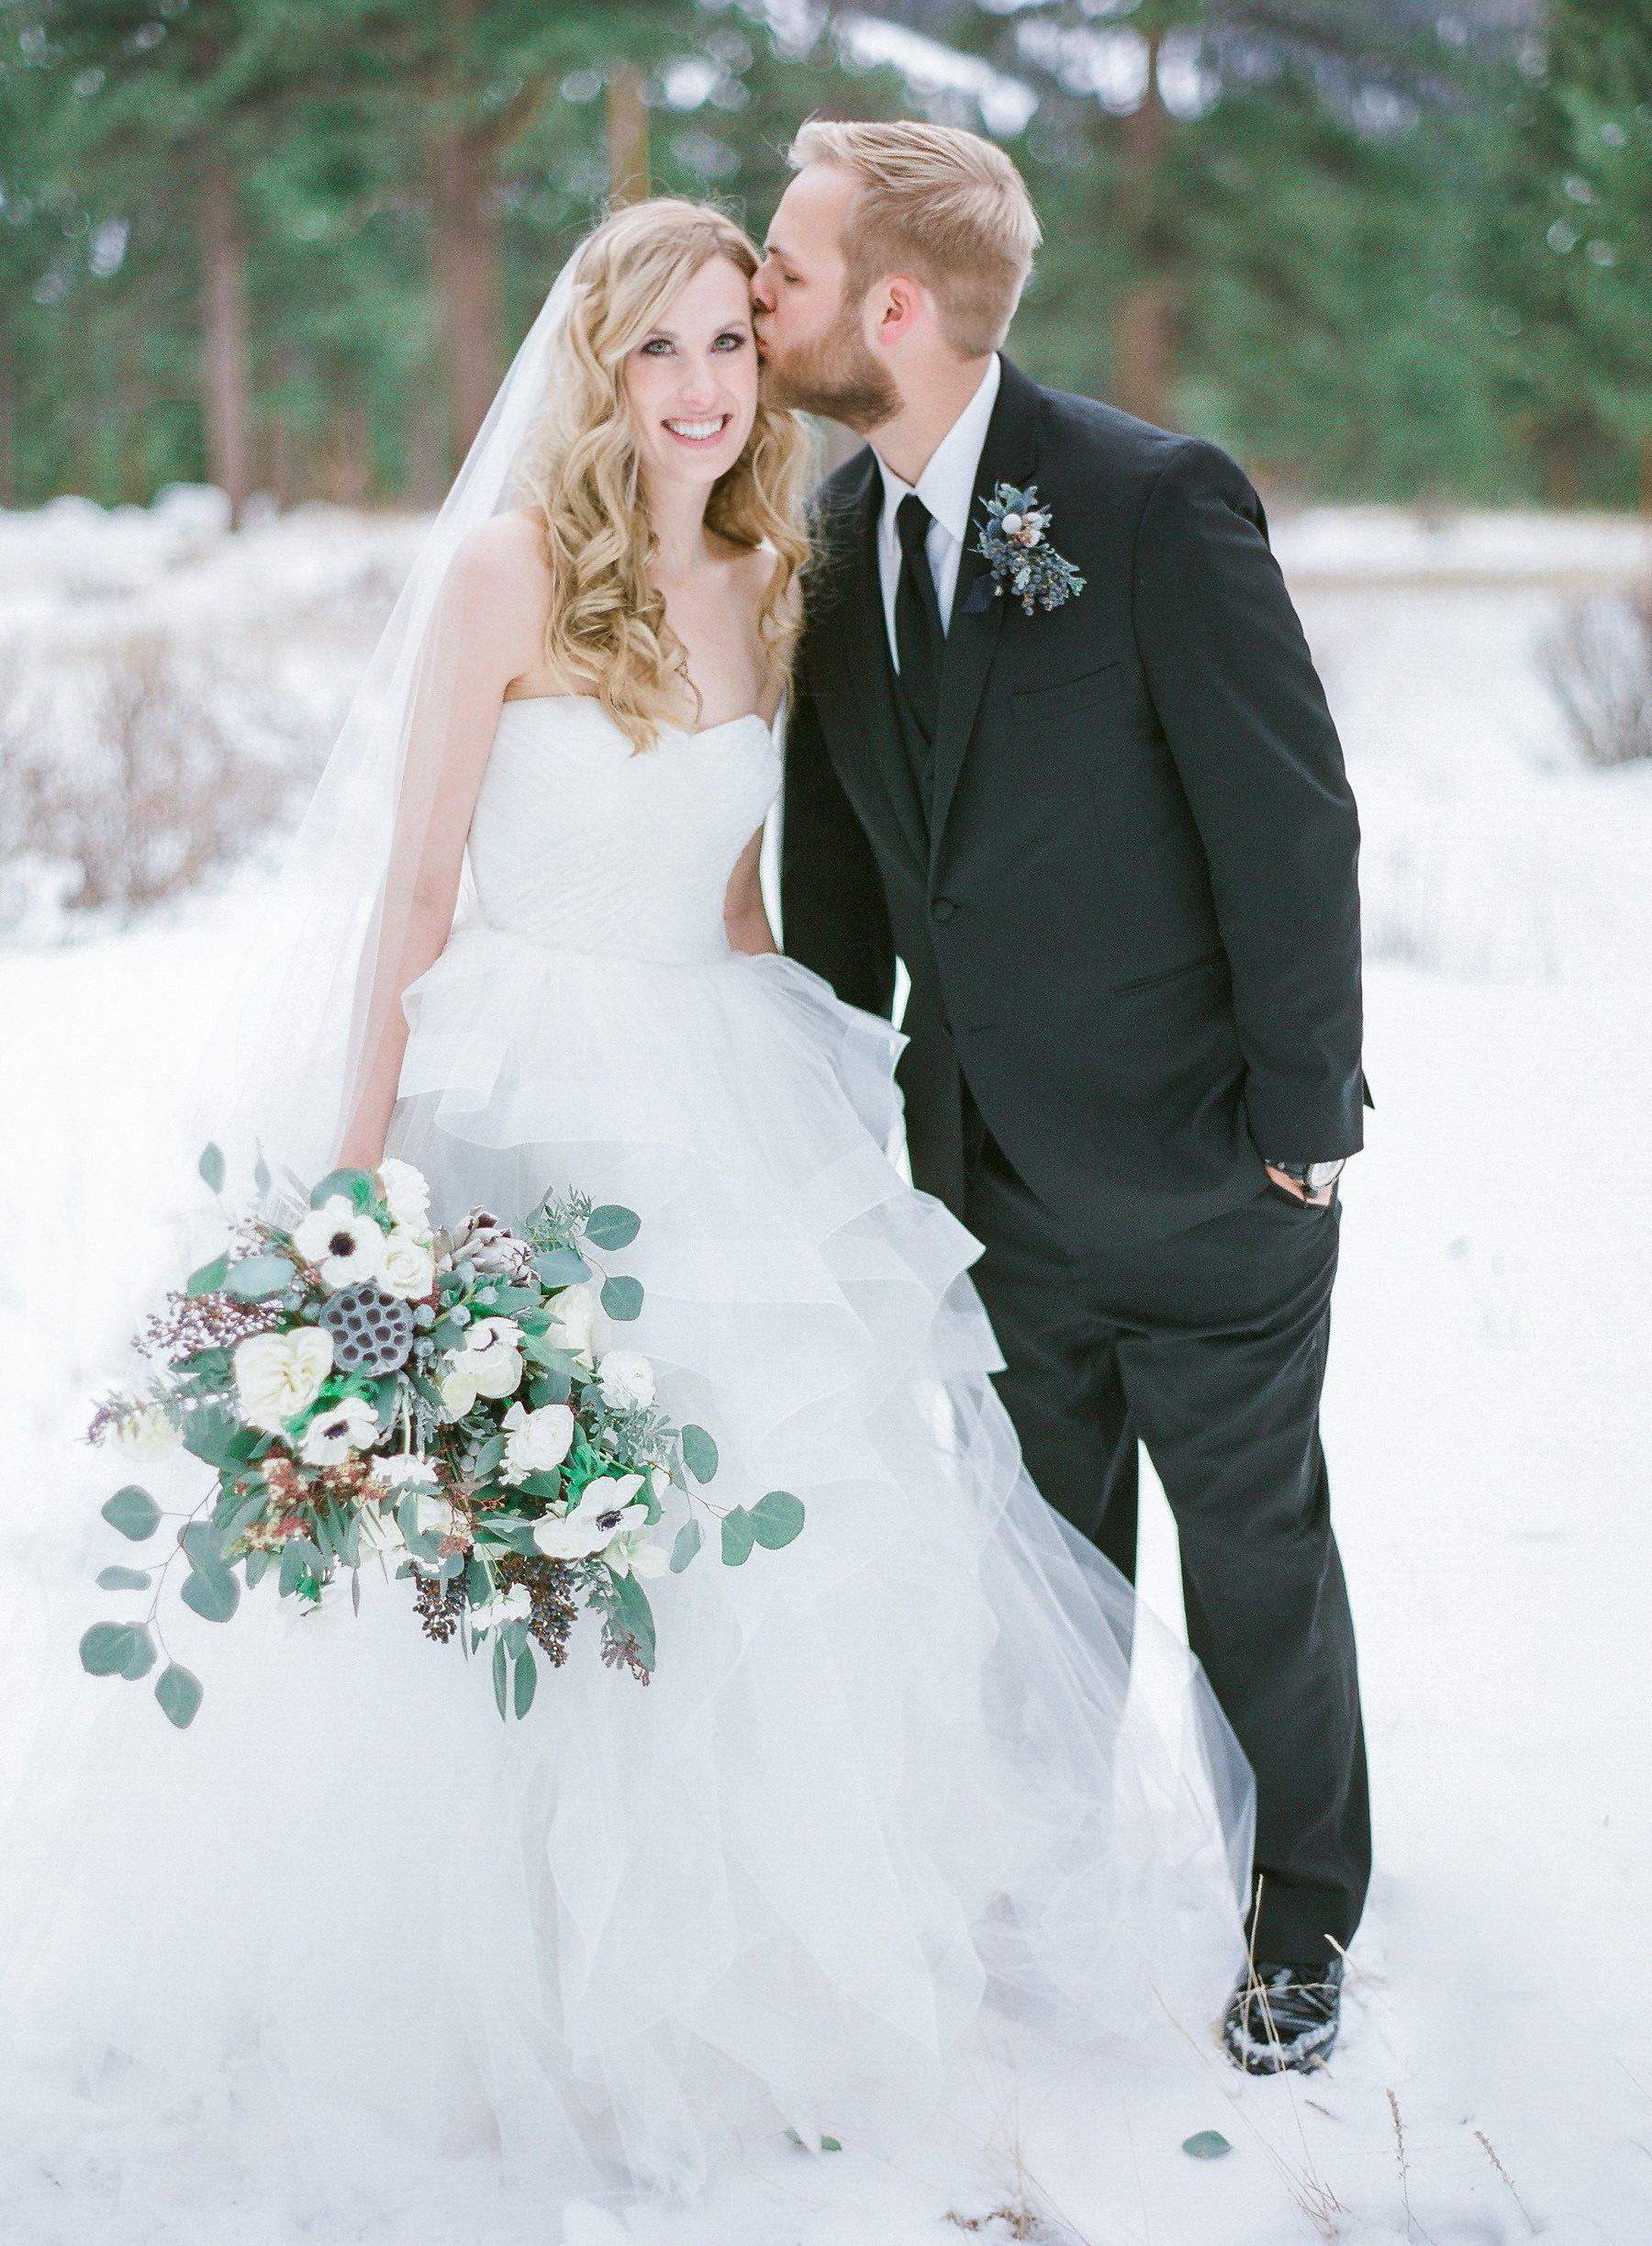 Winter Wedding in Estes Park, Colorado | Della Terra Mountain Chateau | Reem Acra Eliza Wedding Dress | Photography by Shannon Von Eschen